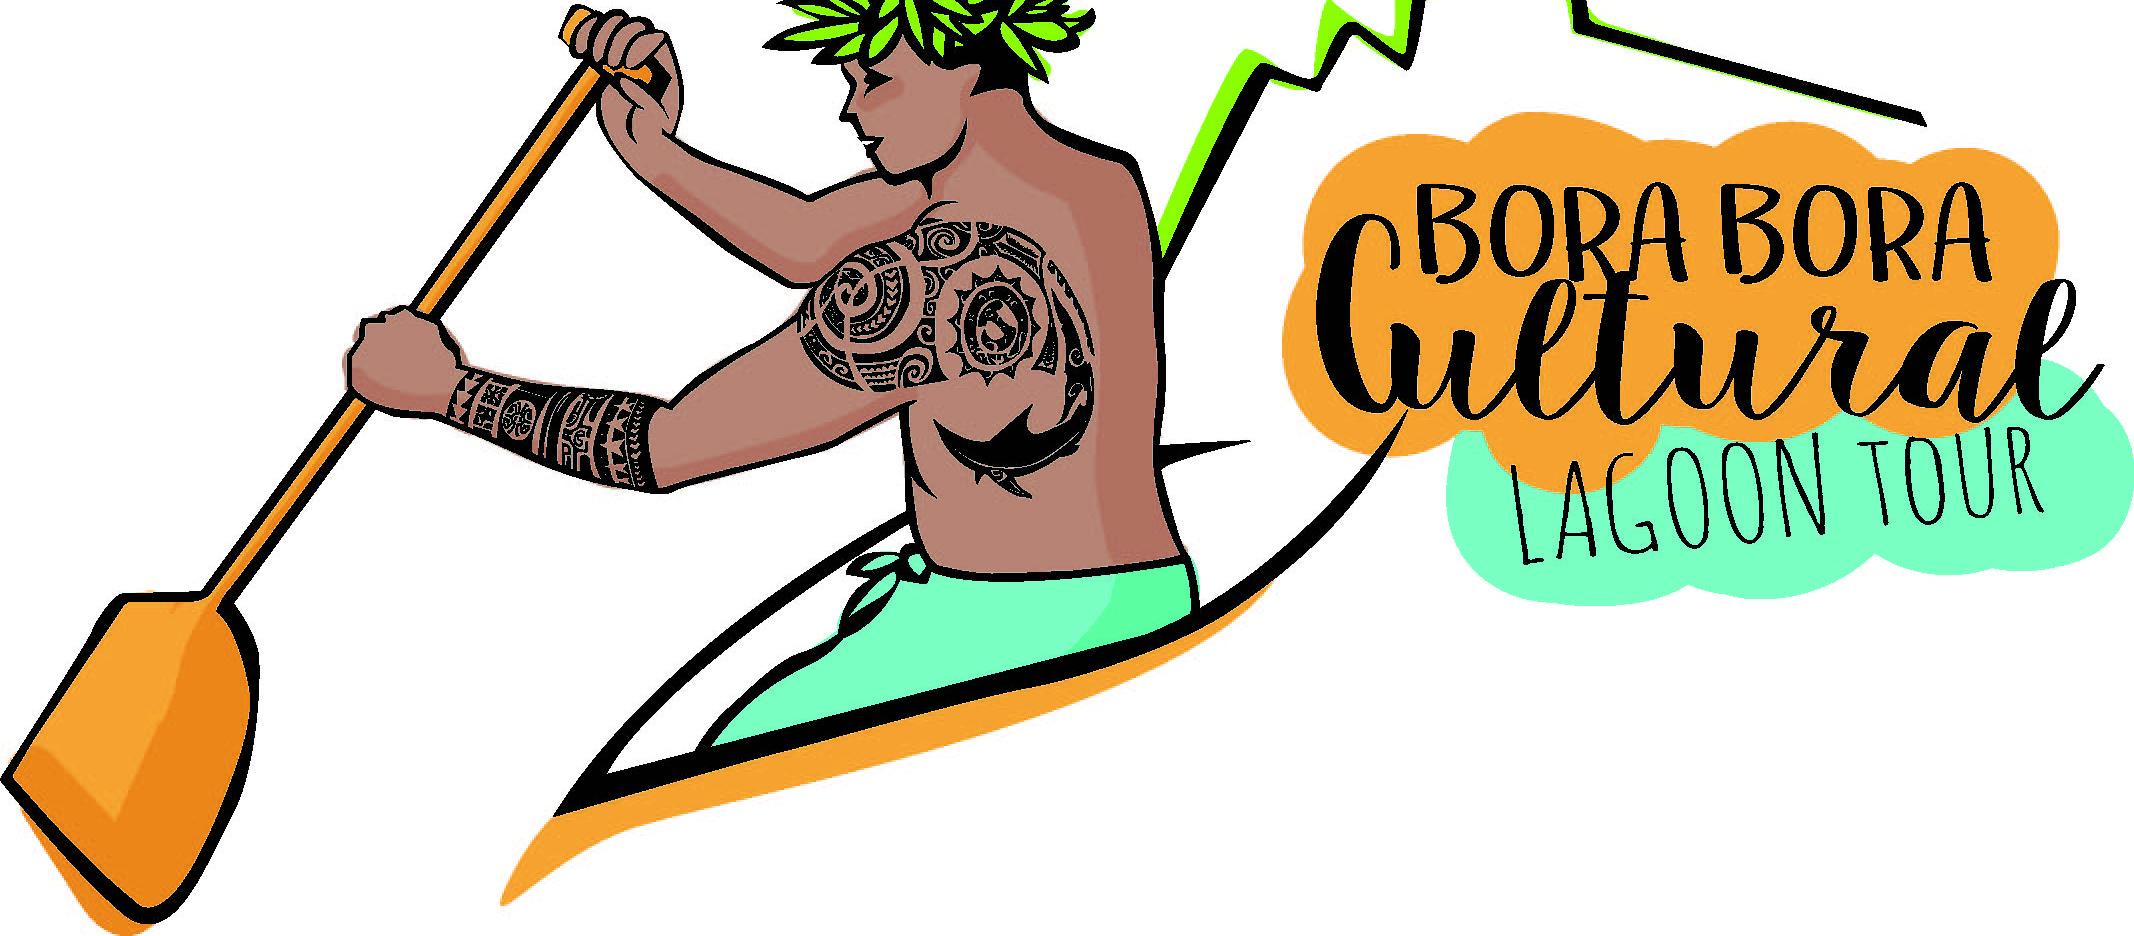 https://tahititourisme.ca/wp-content/uploads/2018/12/Bob-cultural-lagoon-tour.jpg